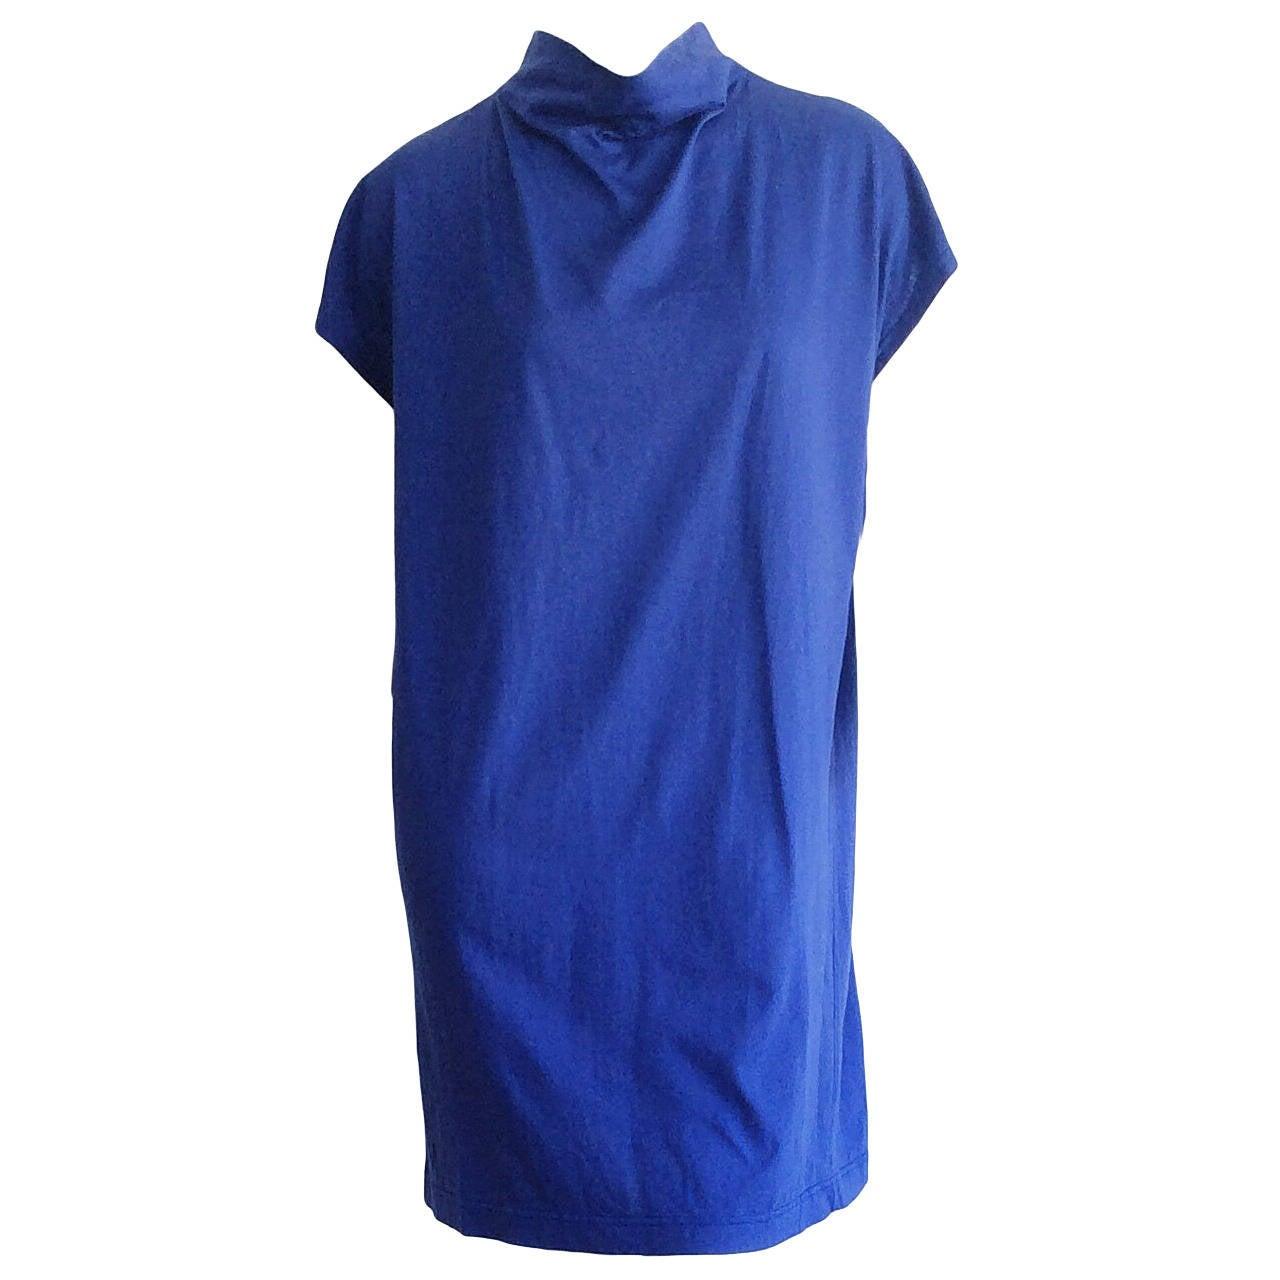 Rare Vintage Issey Miyake Plantation Royal Blue Smock Cotton T - Shirt Dress